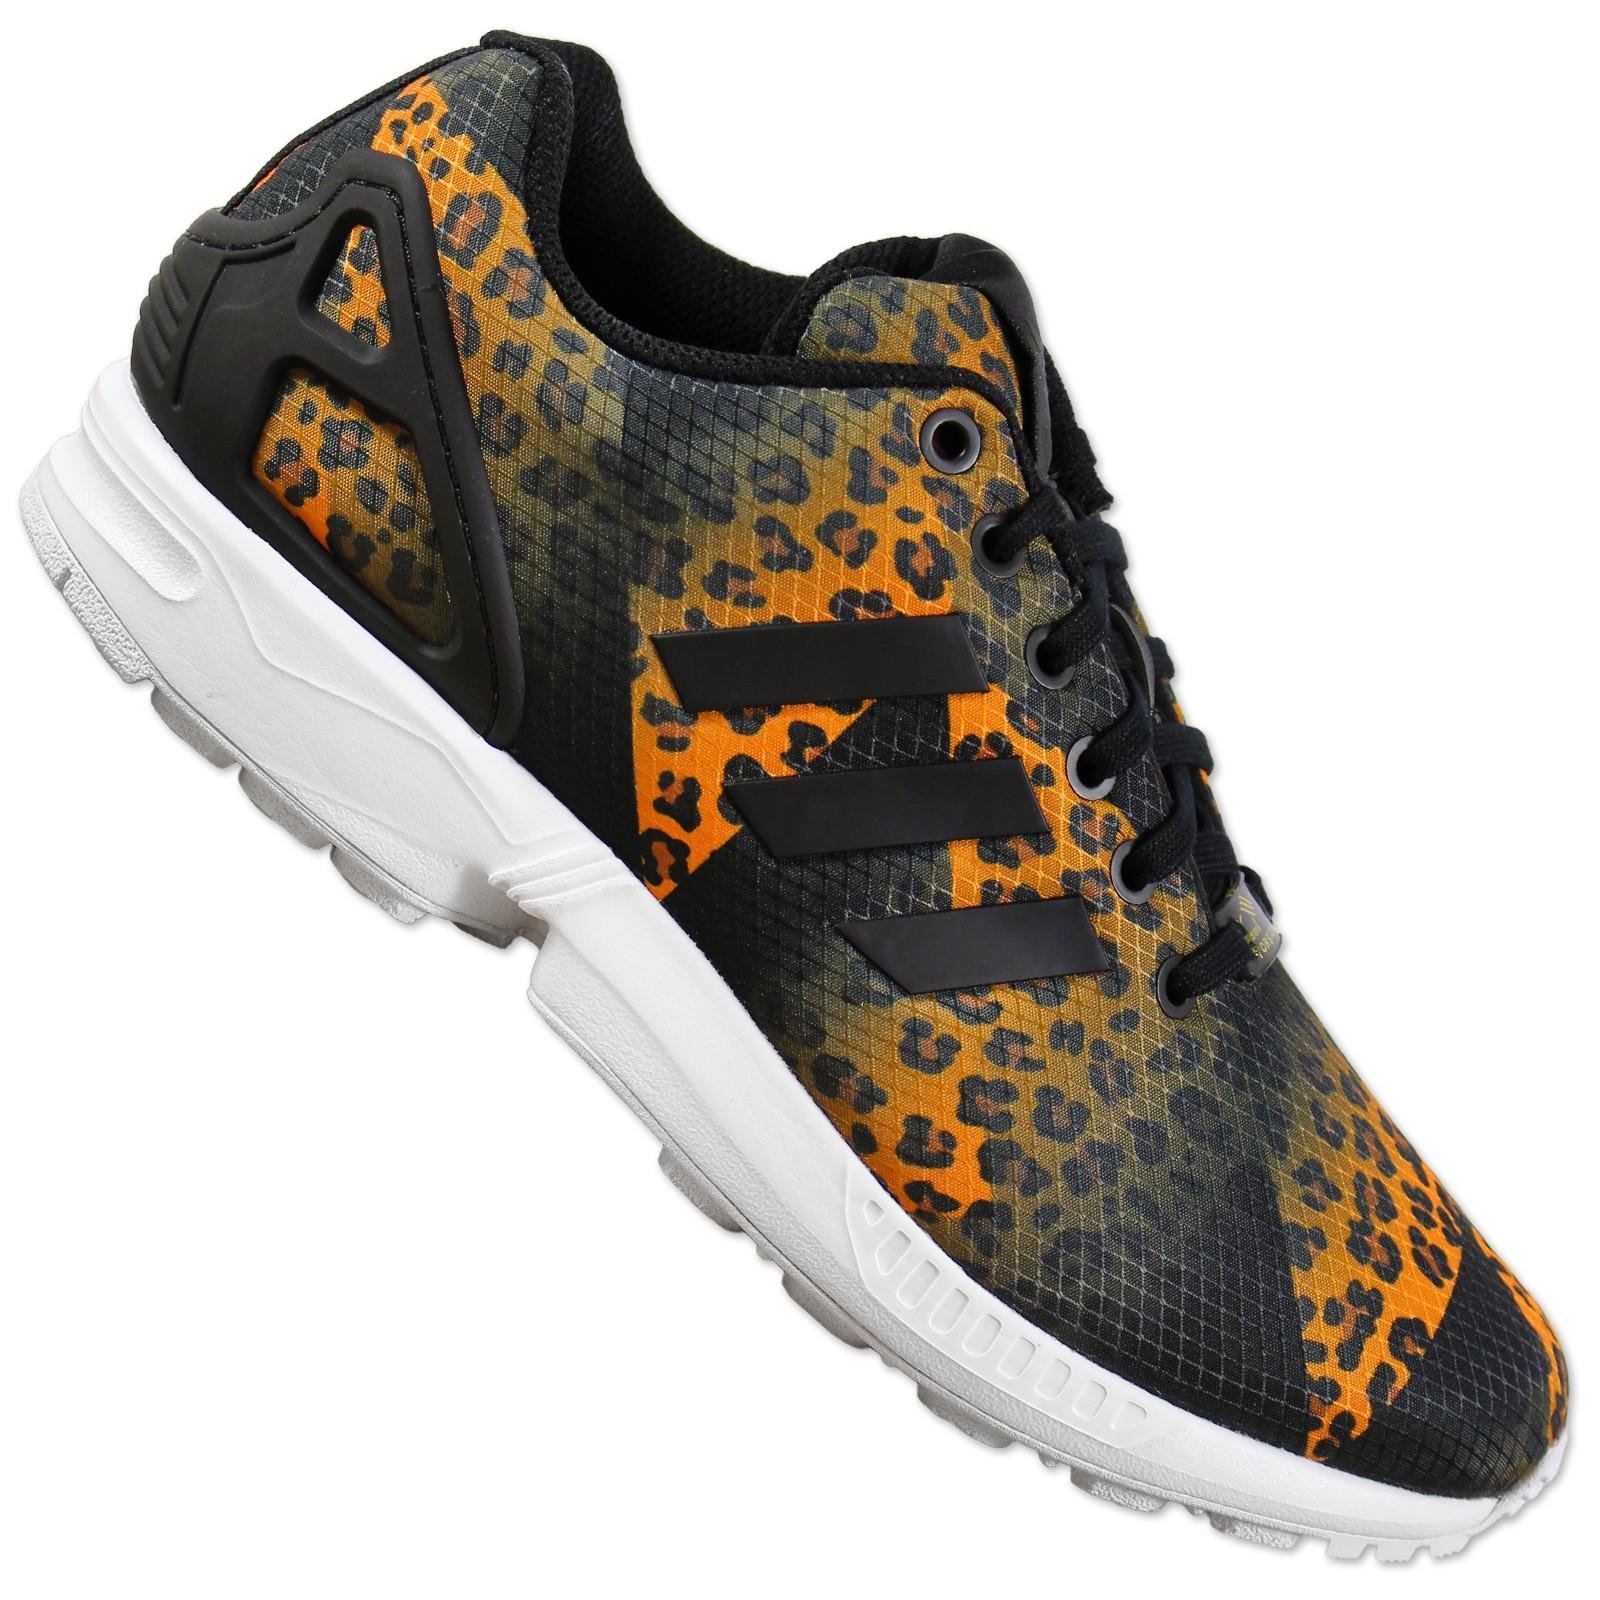 adidas originals zx flux sneaker m75496 schwarz leopard 700 free 750 schuhe ebay. Black Bedroom Furniture Sets. Home Design Ideas